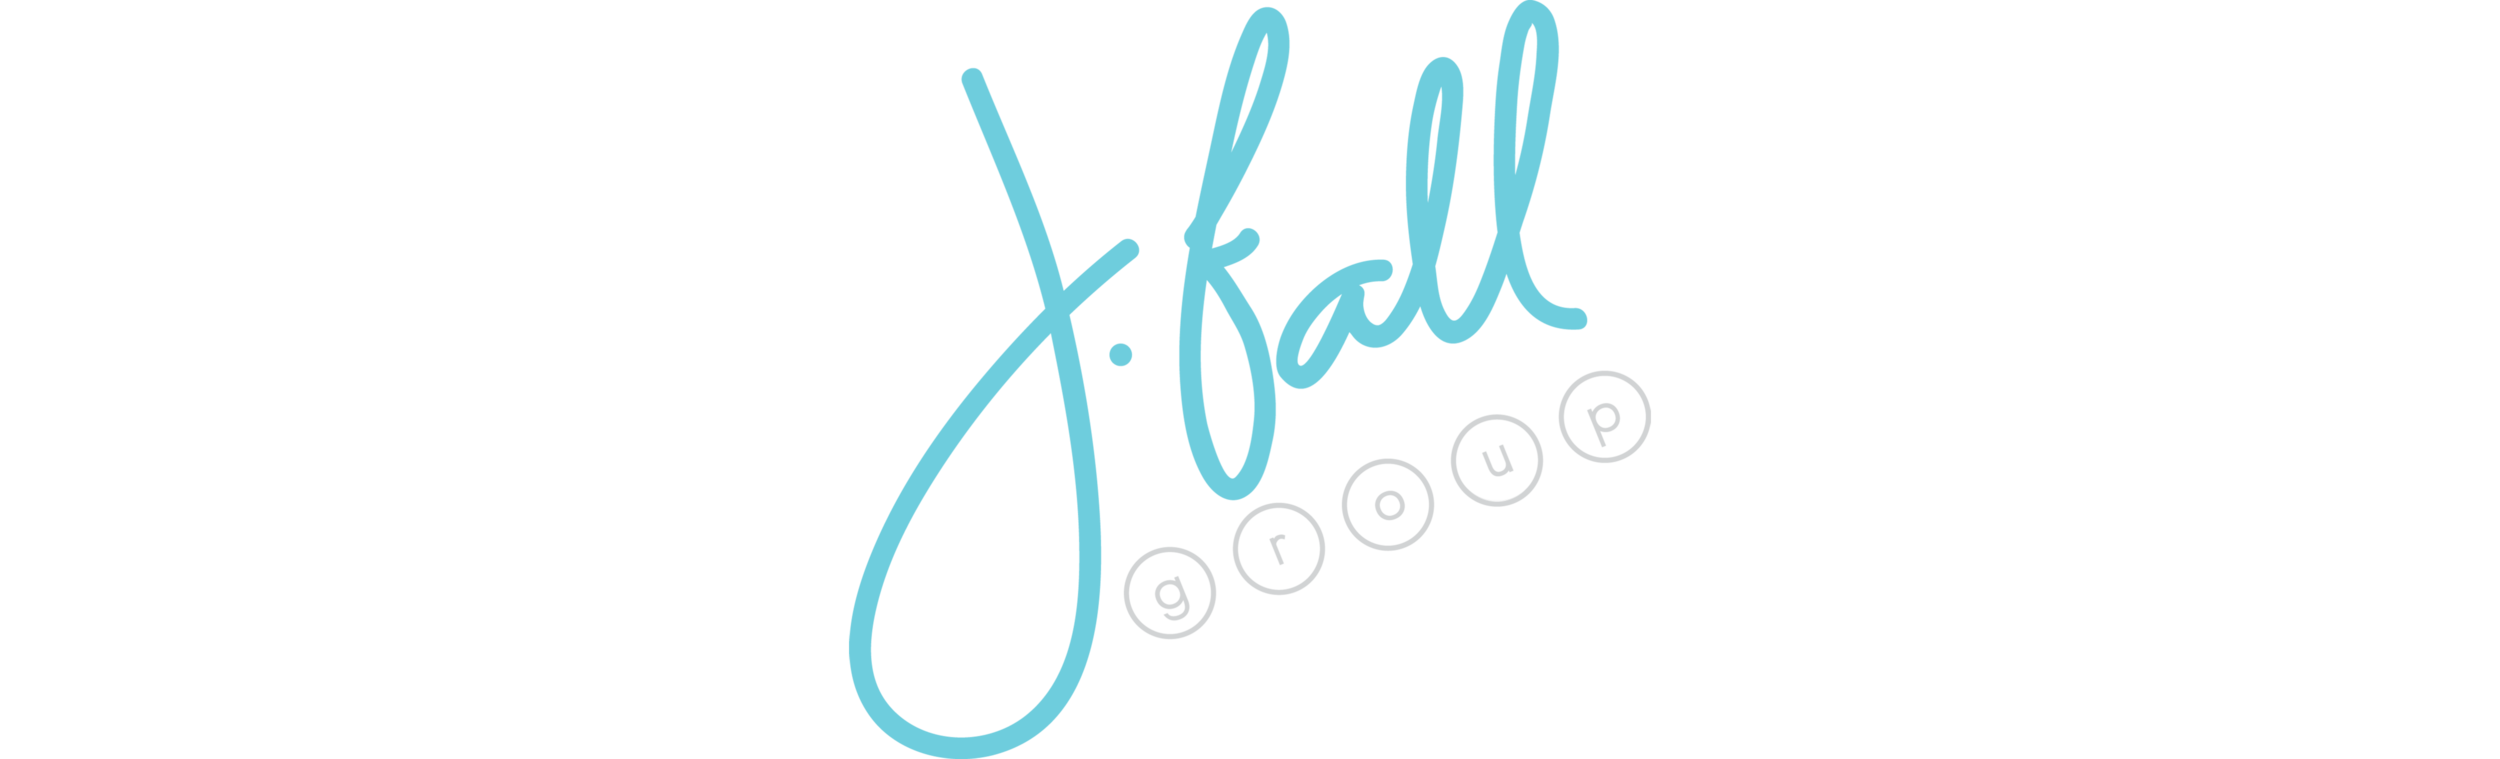 jfallglogo (1) copy.png